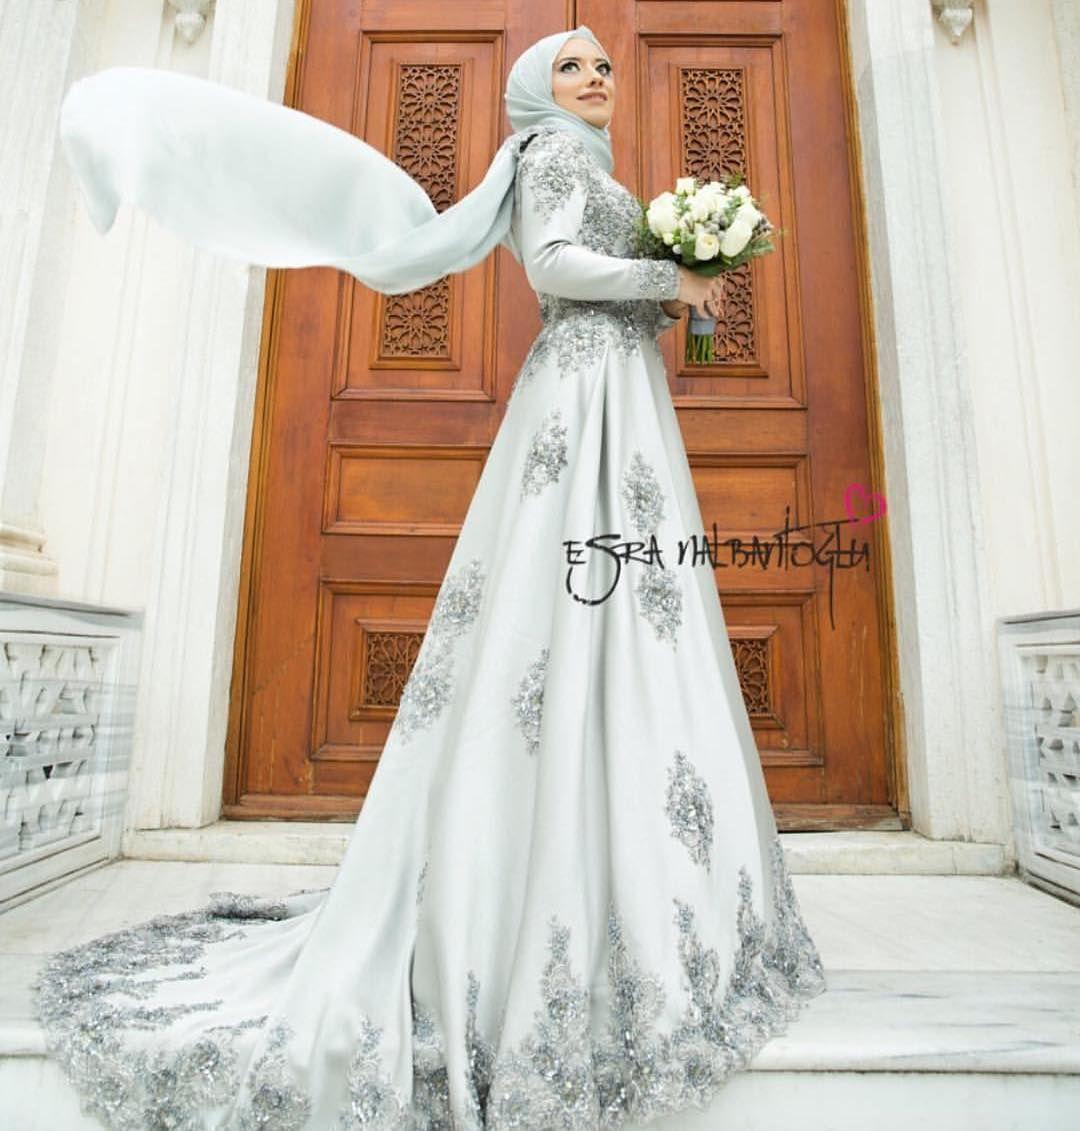 Hijab Engagement Dresses – 27 Beautiful Engagement Dresses for Hijabis advise